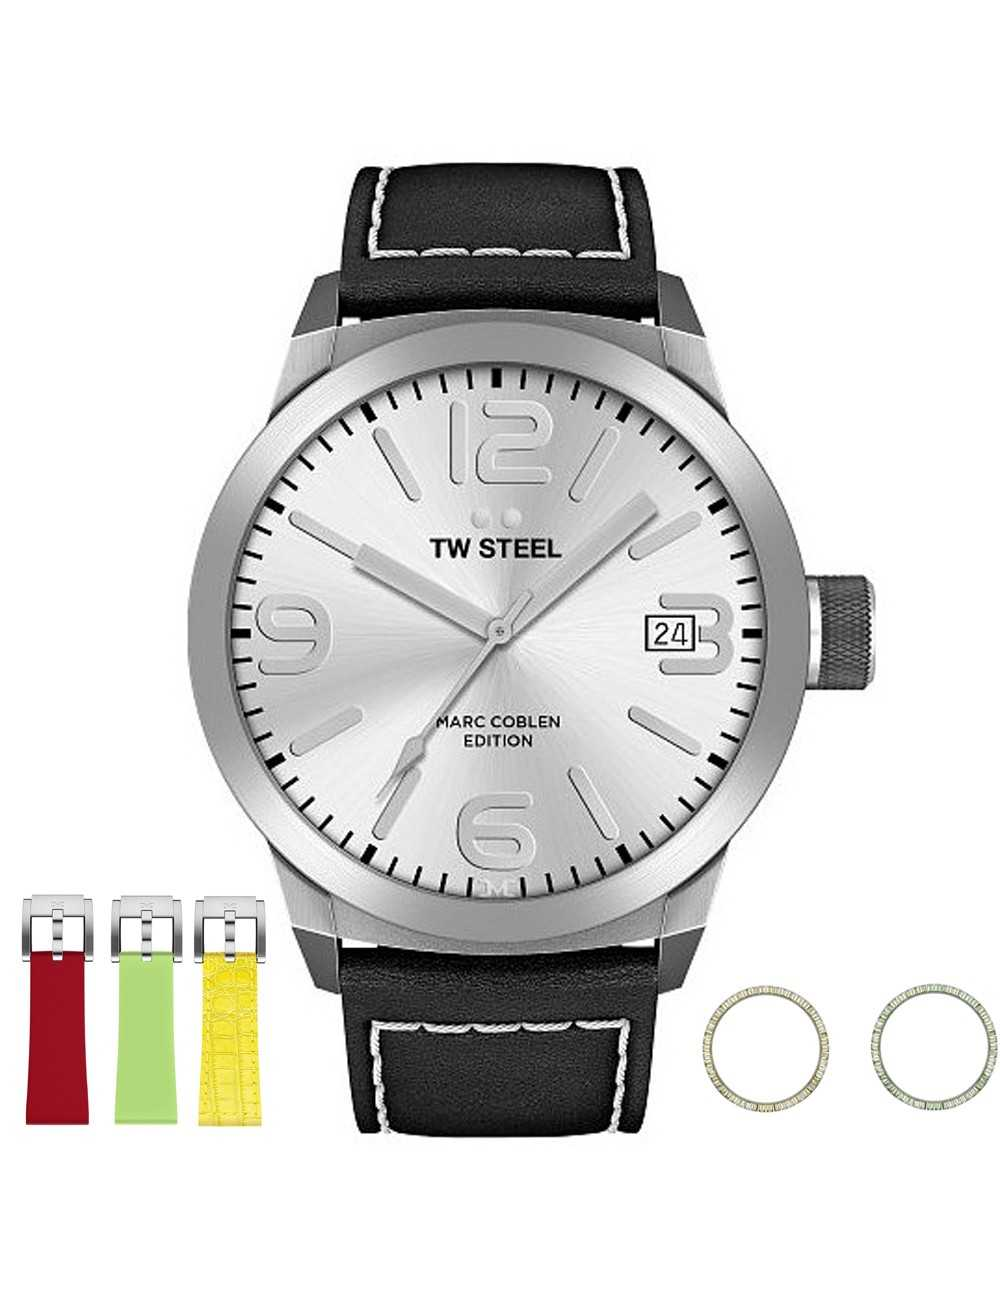 Pánske hodinky TW Steel Marc Coblen Edition TWMC24